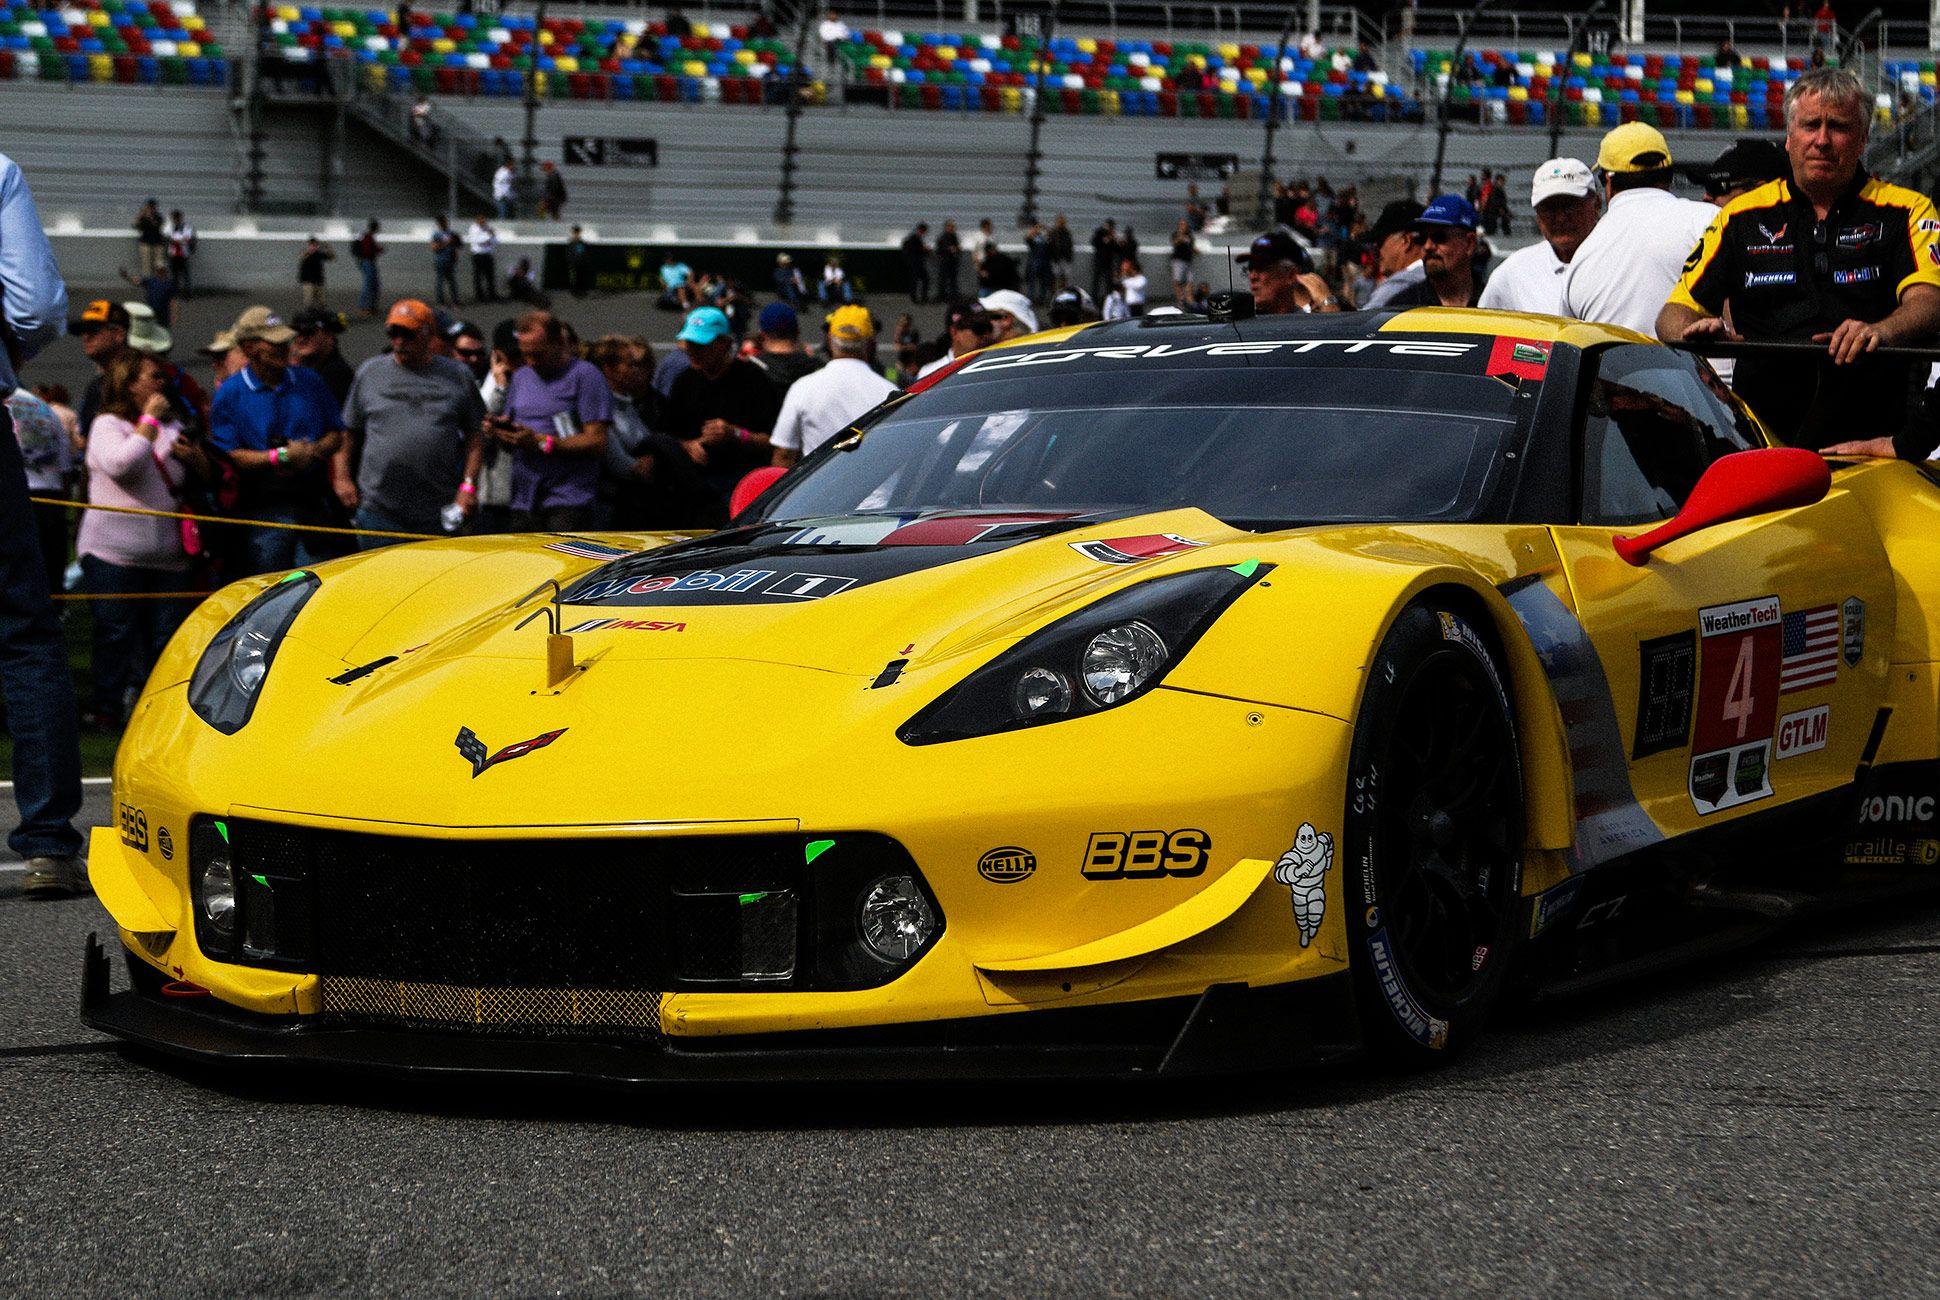 Best-Sports-Cars-of-2018-Daytona-24-Hours-gear-patrol-Corvette-C7R-2